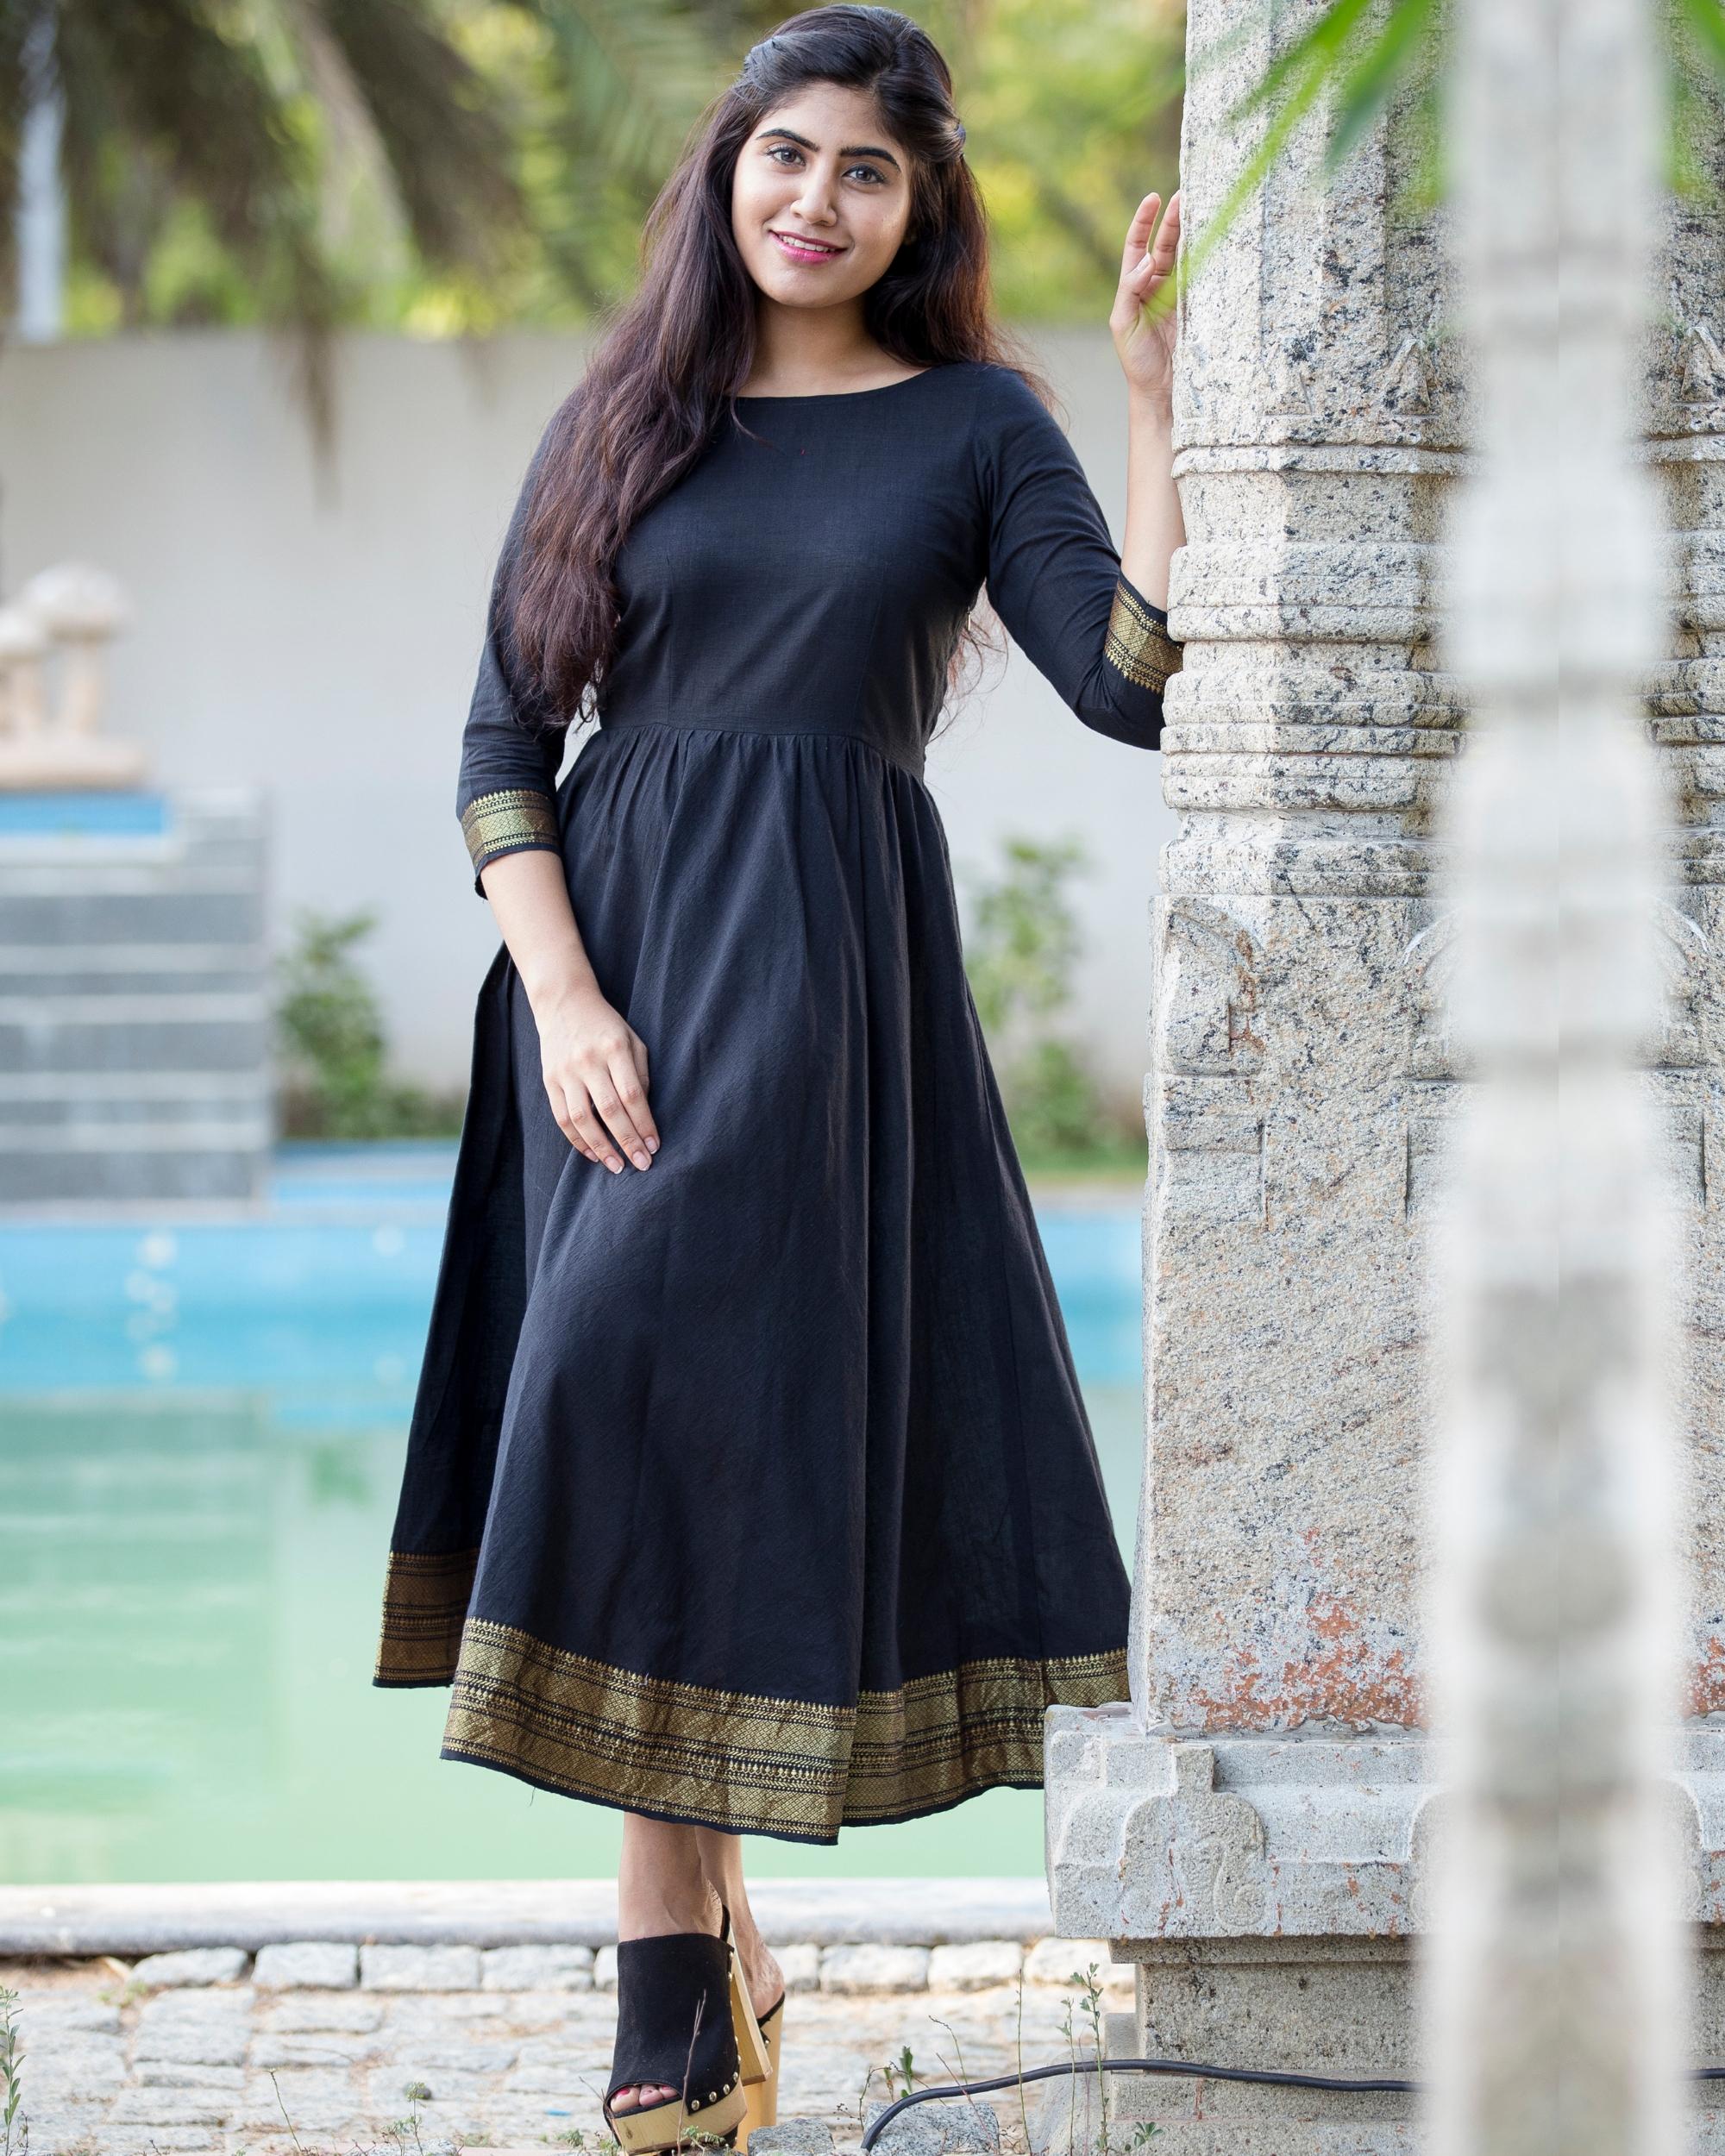 Zari detailed black flared dress